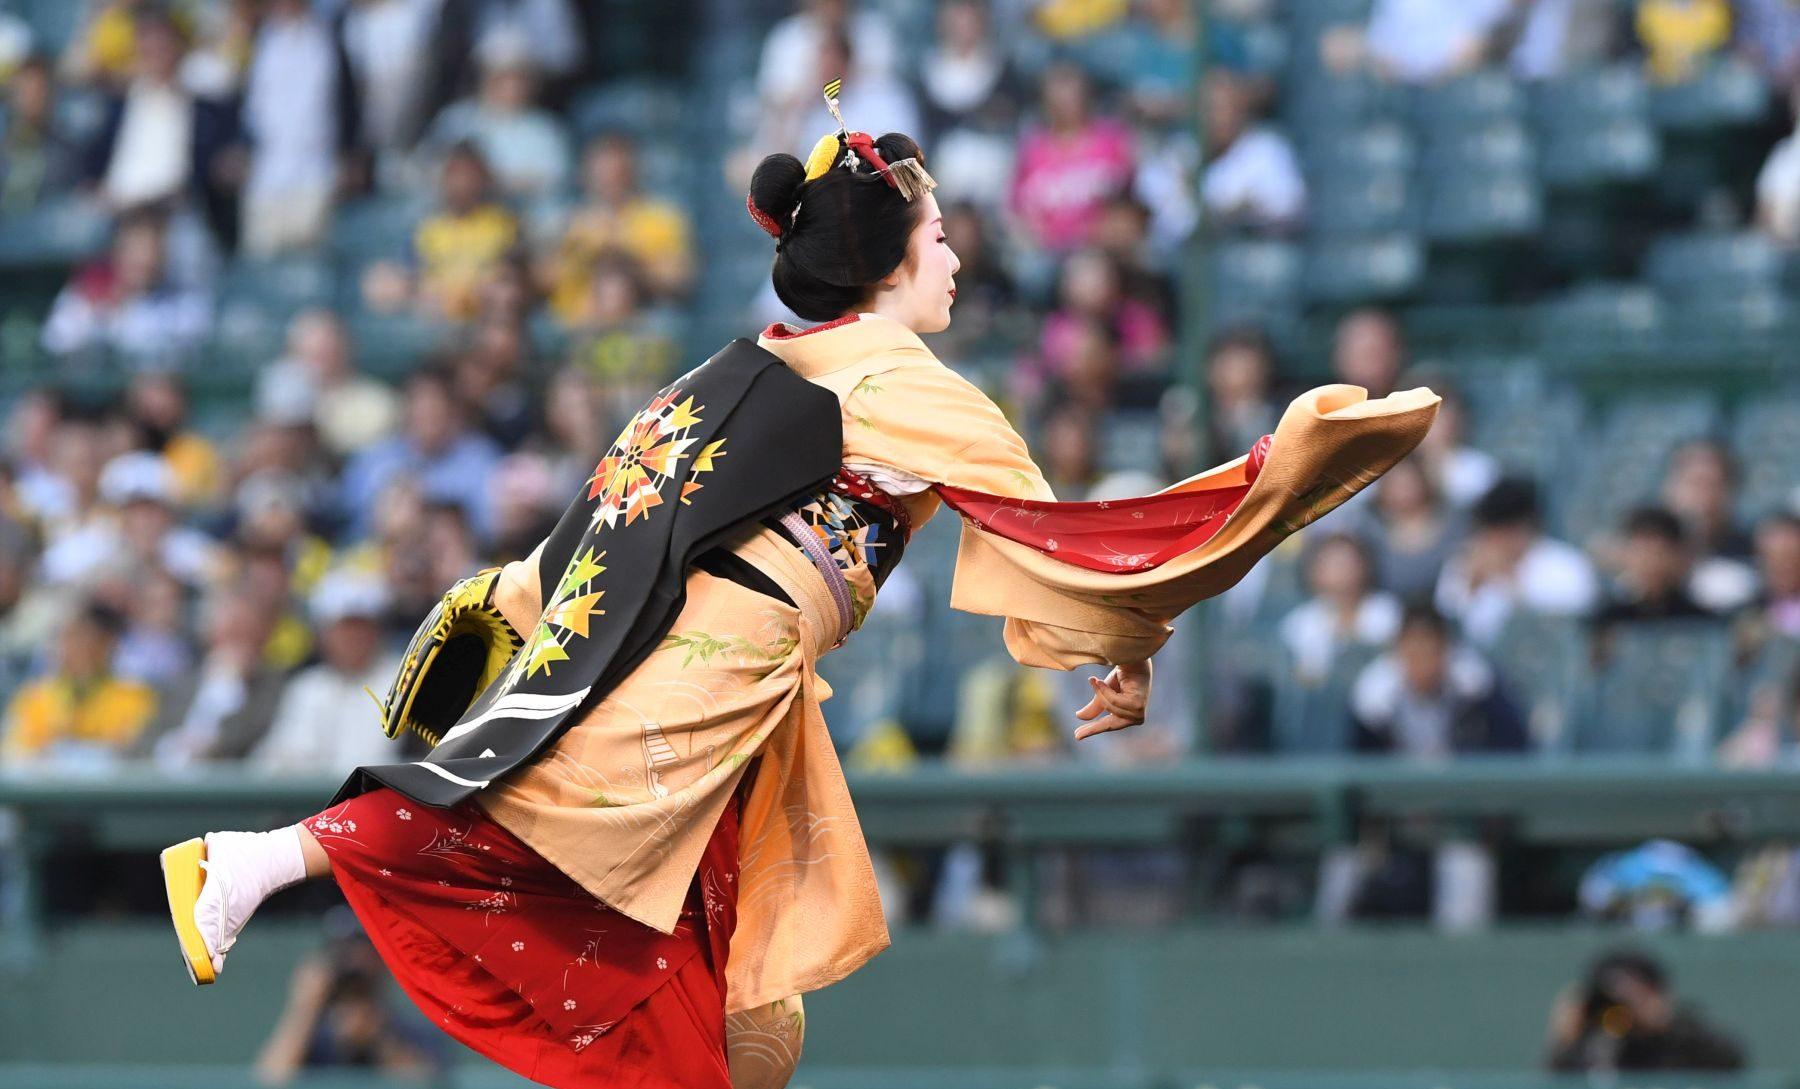 Maiko First Pitch of the Baseball Season